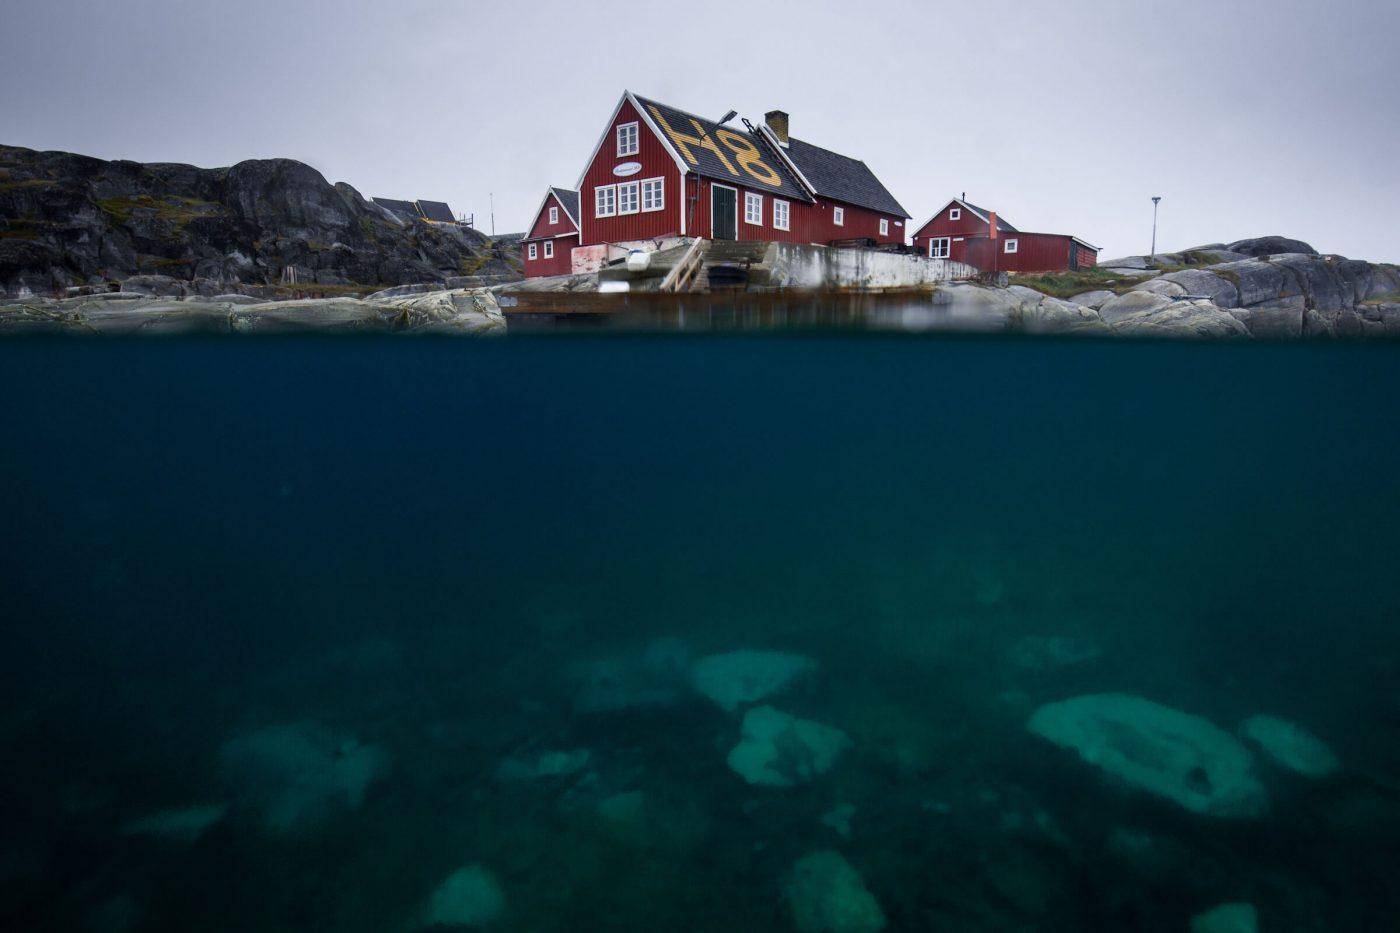 Restaurant H8 in Oqaatsut in the Disko Bay, Greenland. Photo by Mads Pihl - Visit Greenland